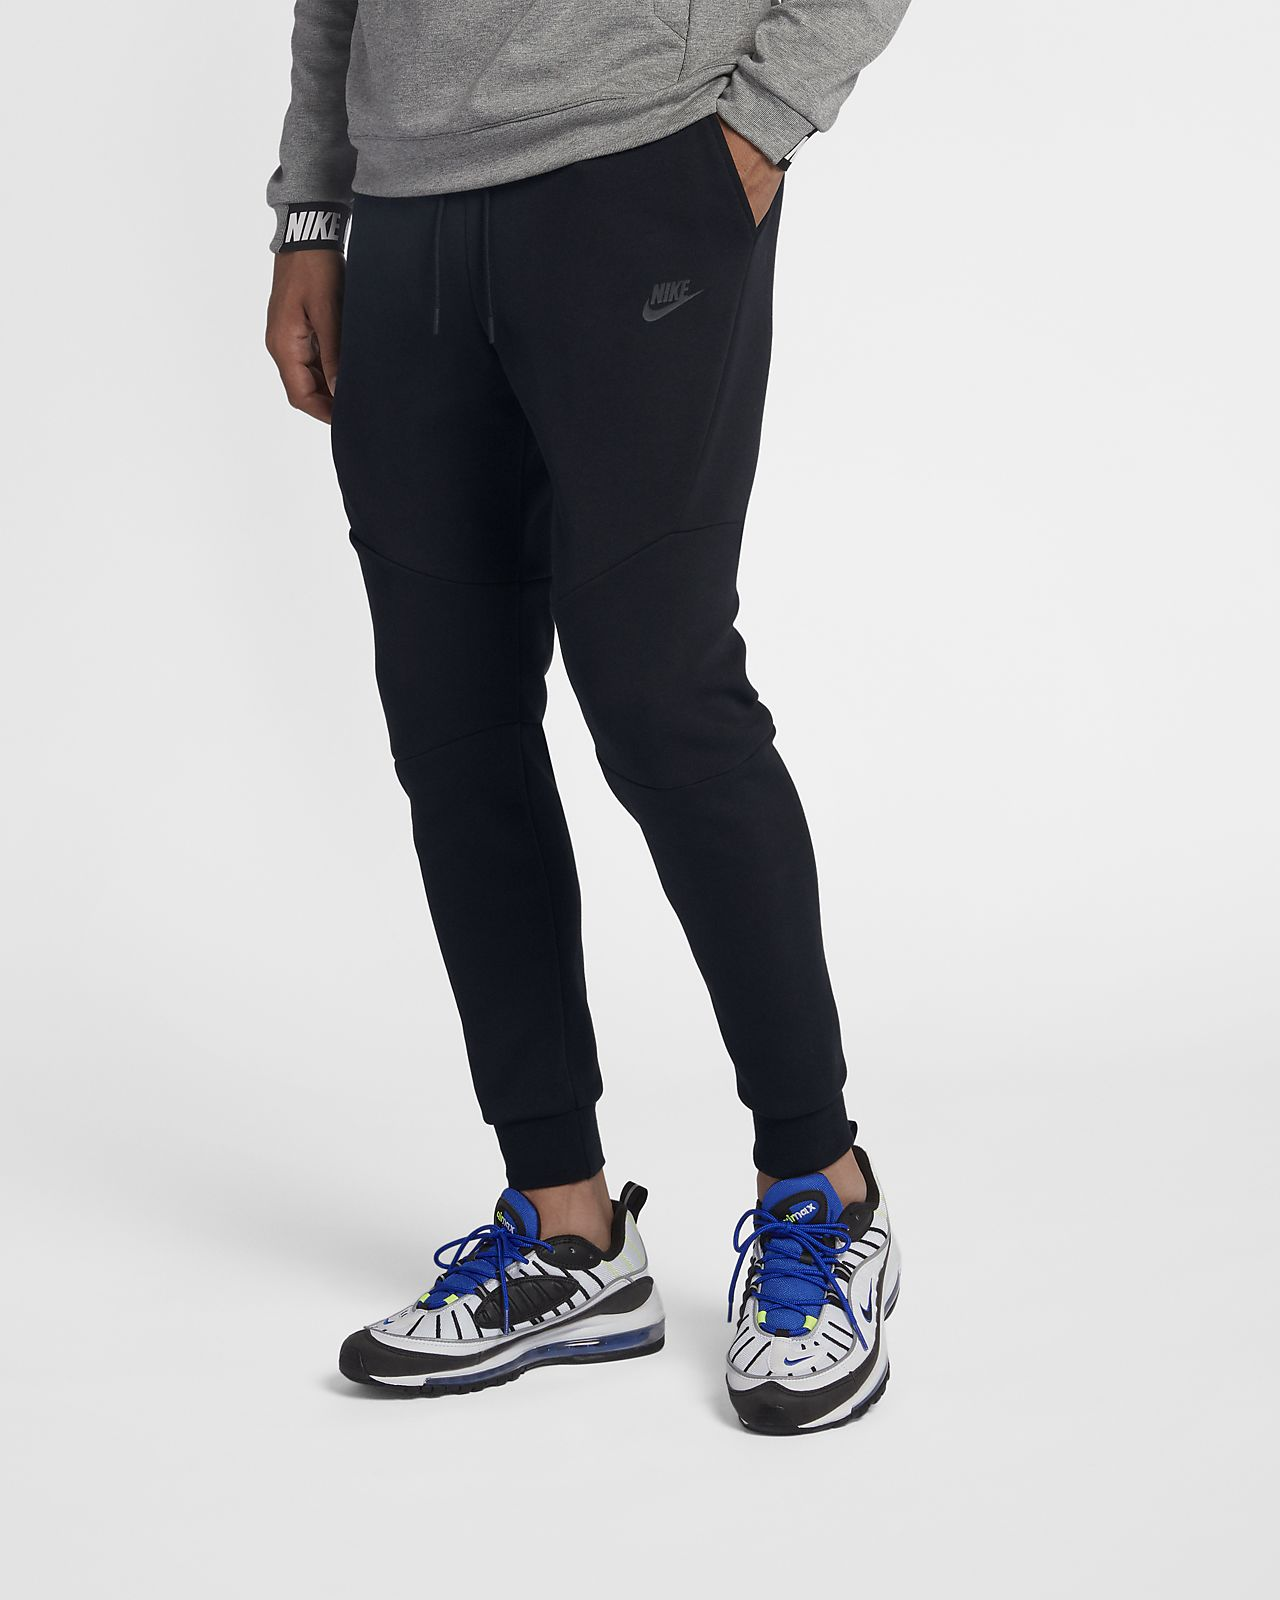 Pantalones deportivos para hombre Nike Sportswear Tech Fleece. Nike ... 31f6a33dedaa8